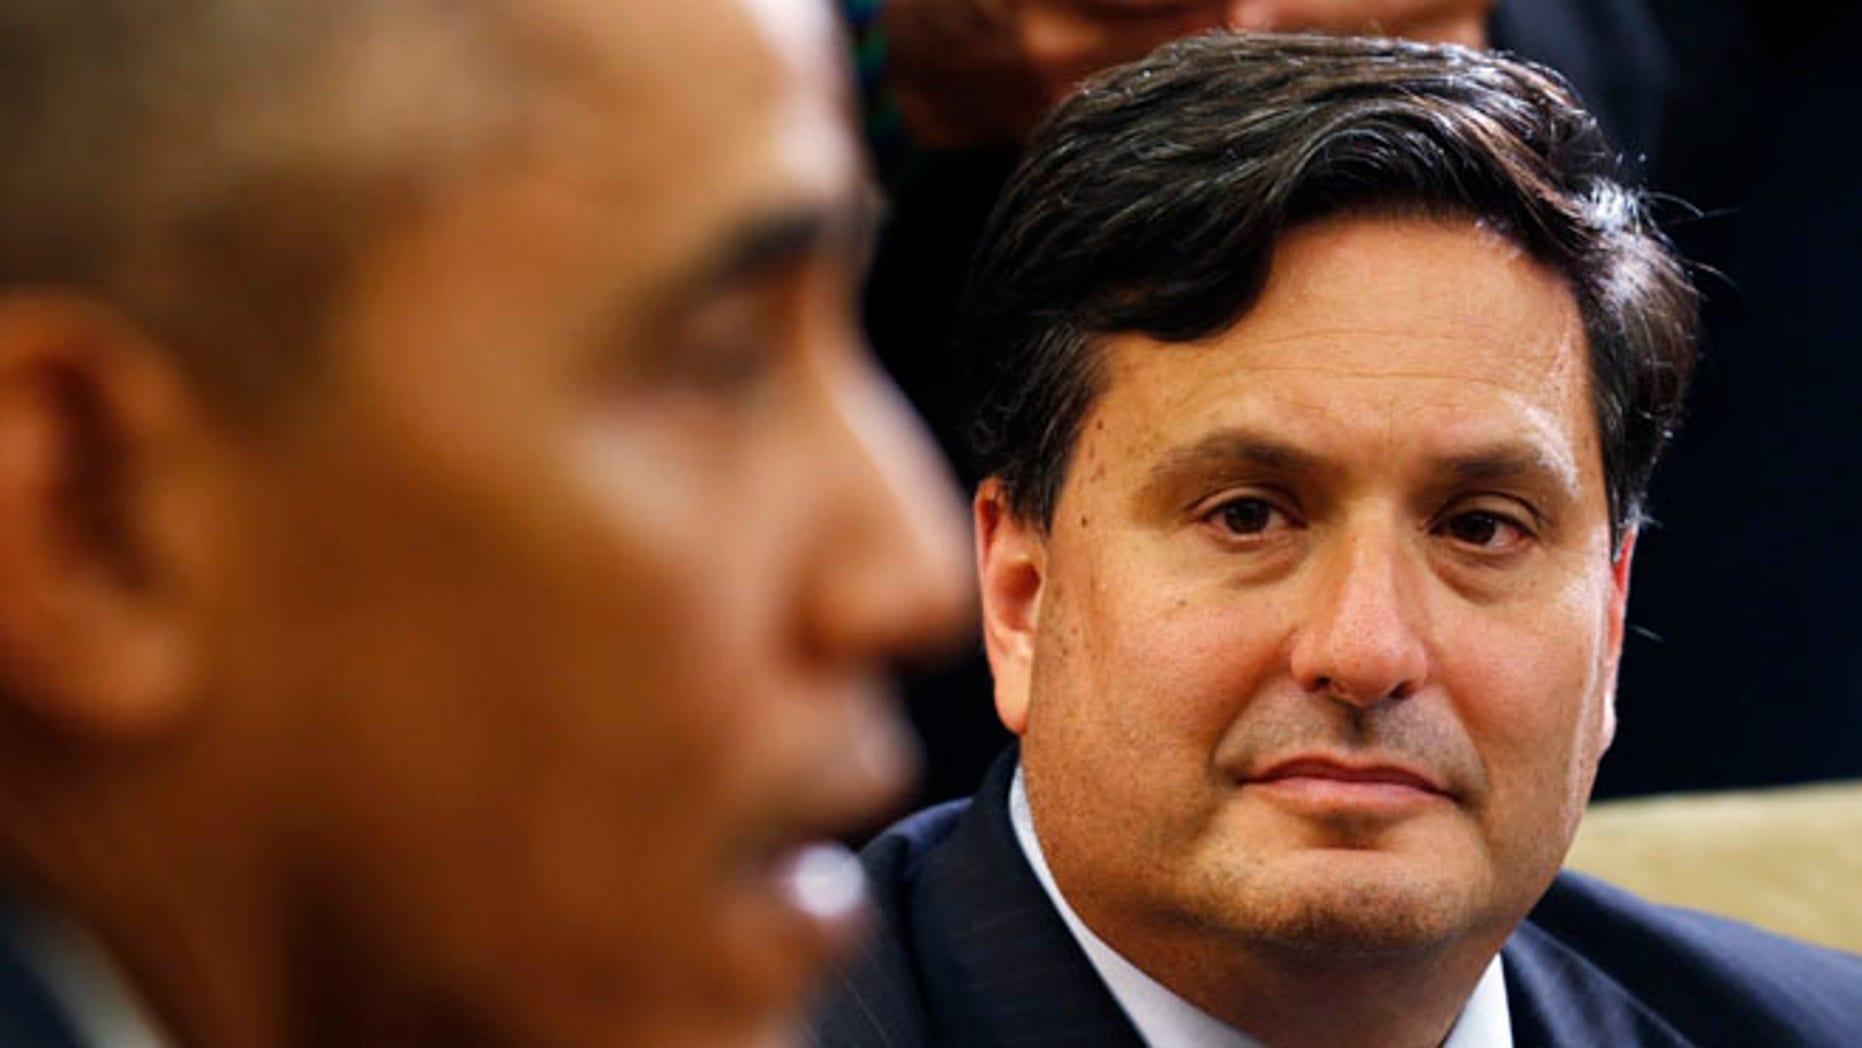 FILE: Oct. 22, 2014: President Obama and Ebola Response Coordinator Ron Klain.